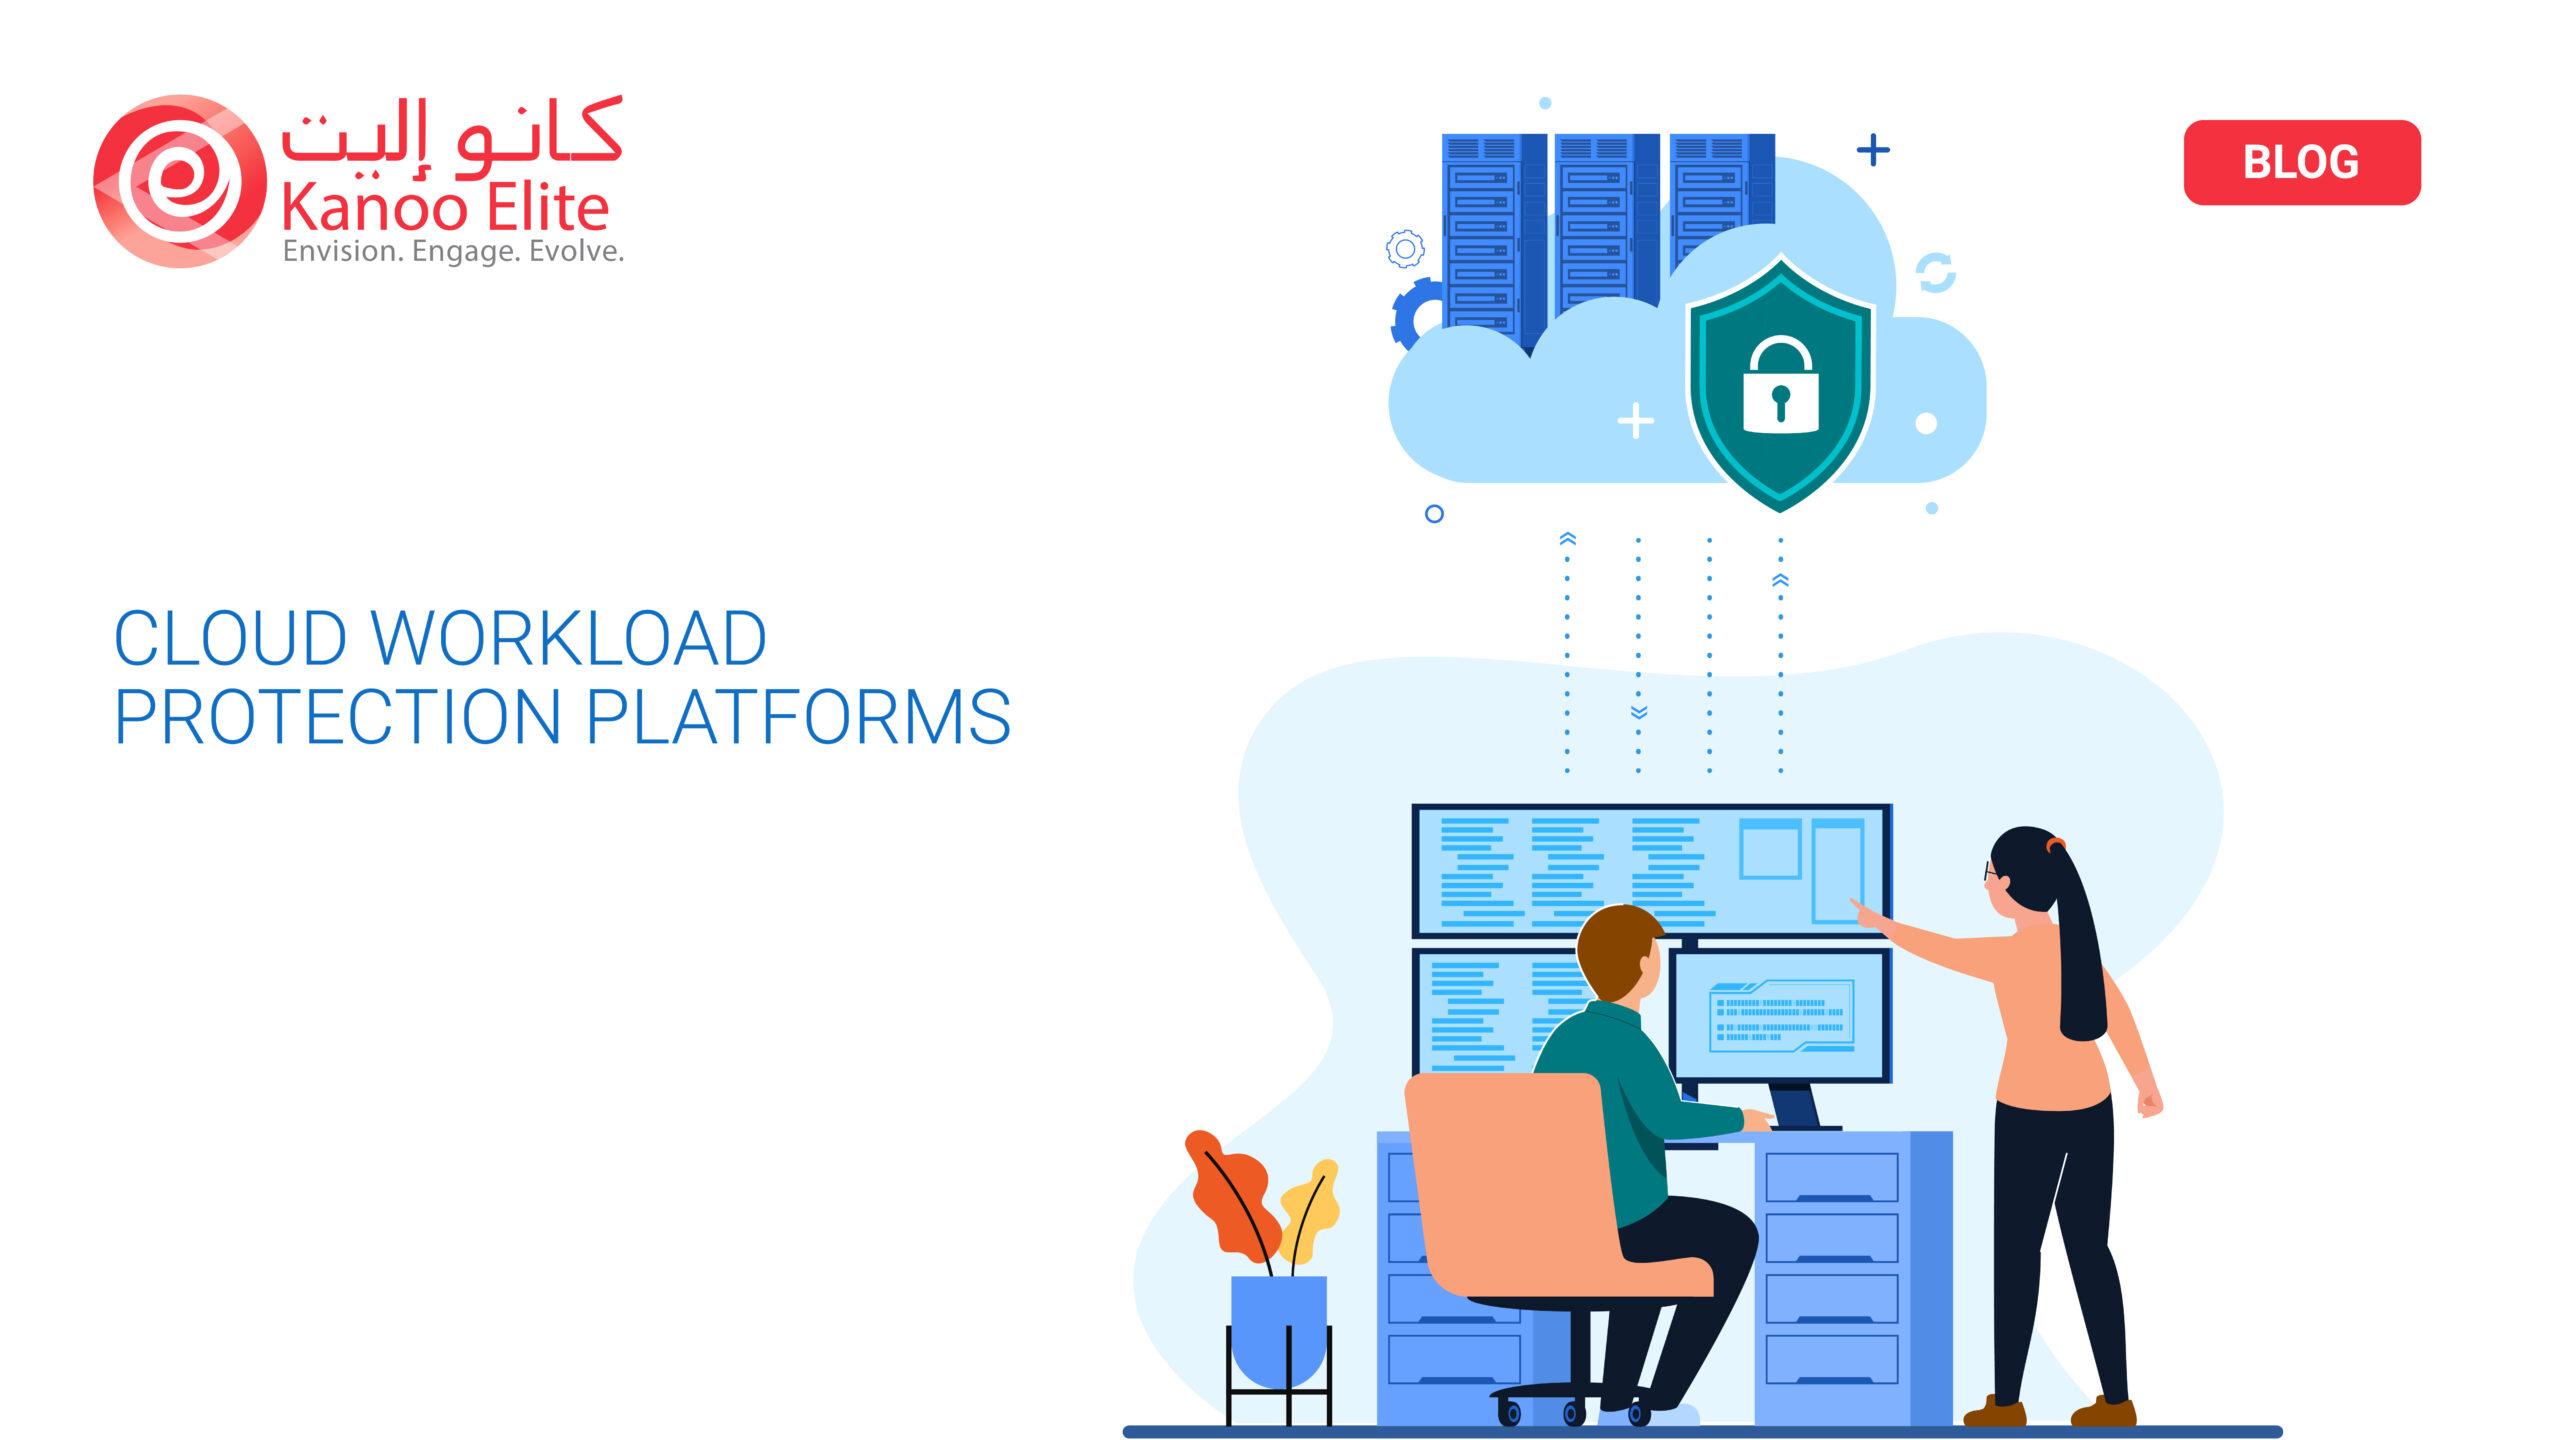 Cloud Workload Protection Platform